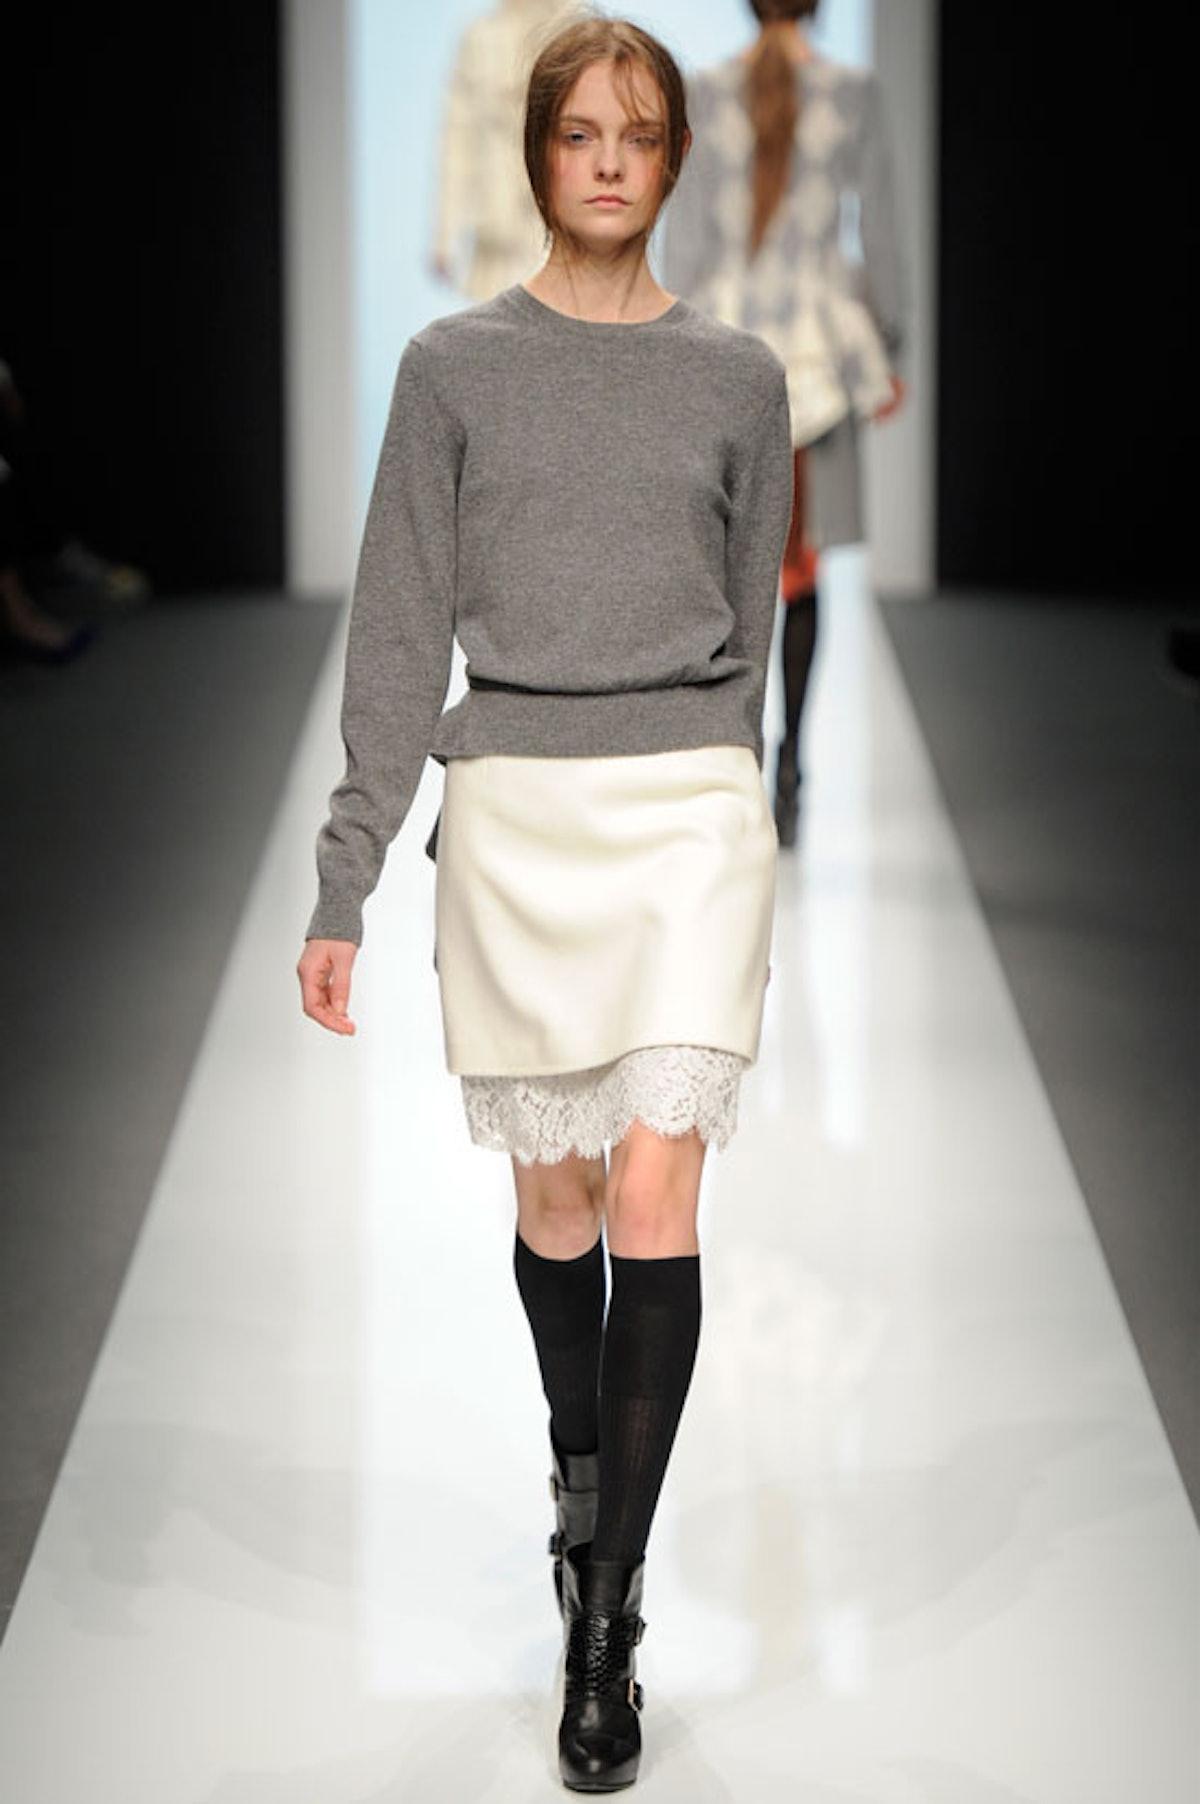 blog-Sacai-Fall-2012-Look-32.jpg